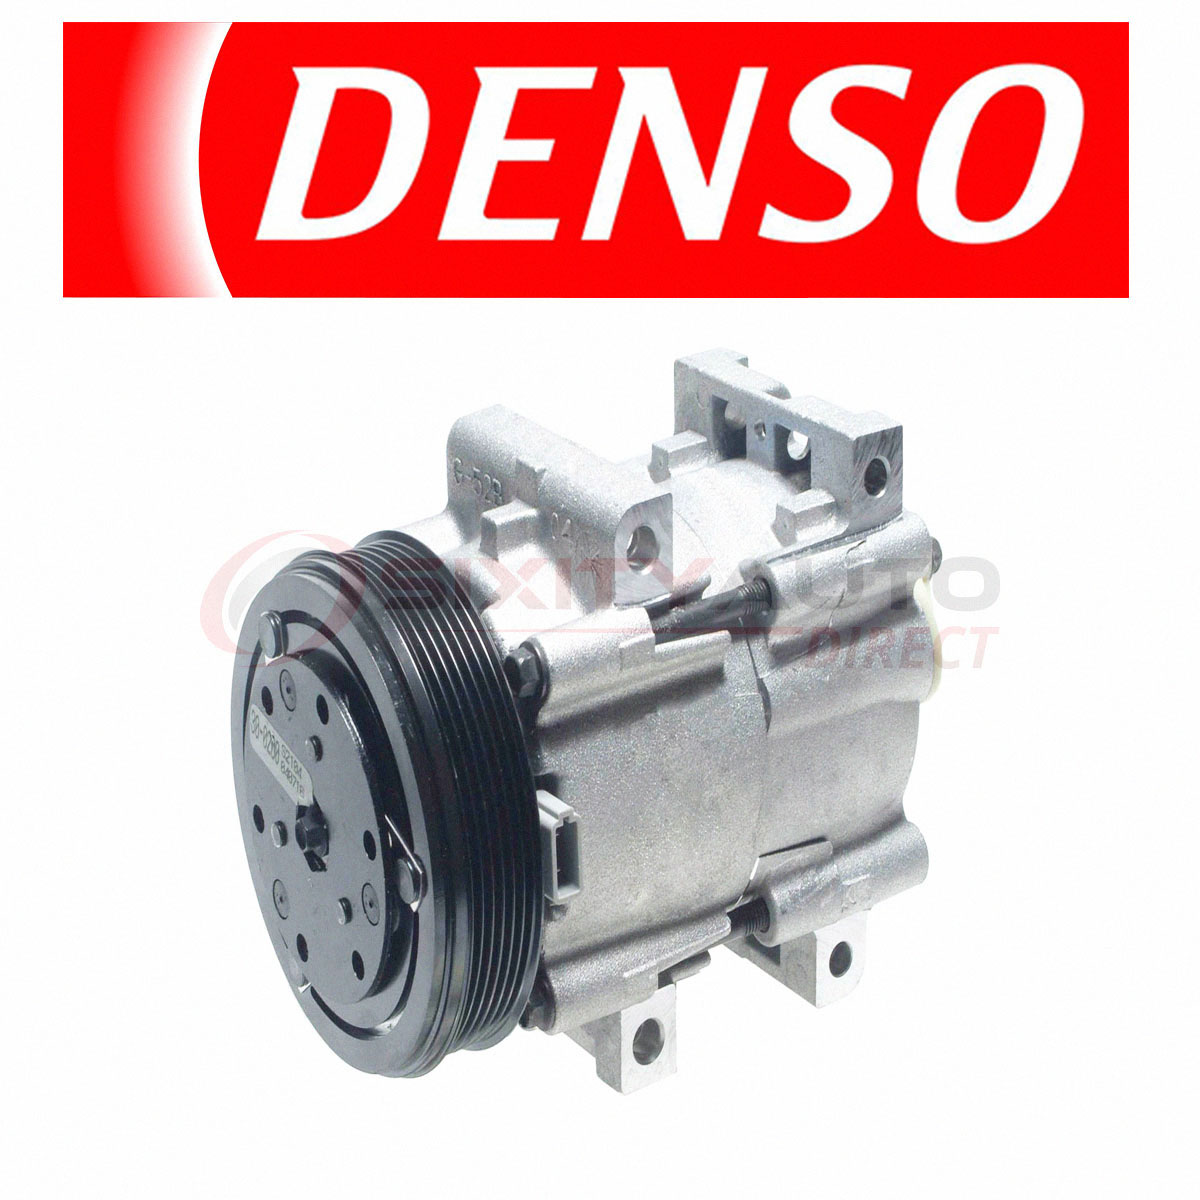 A//C Compressor and Clutch-New Compressor DENSO 471-8109